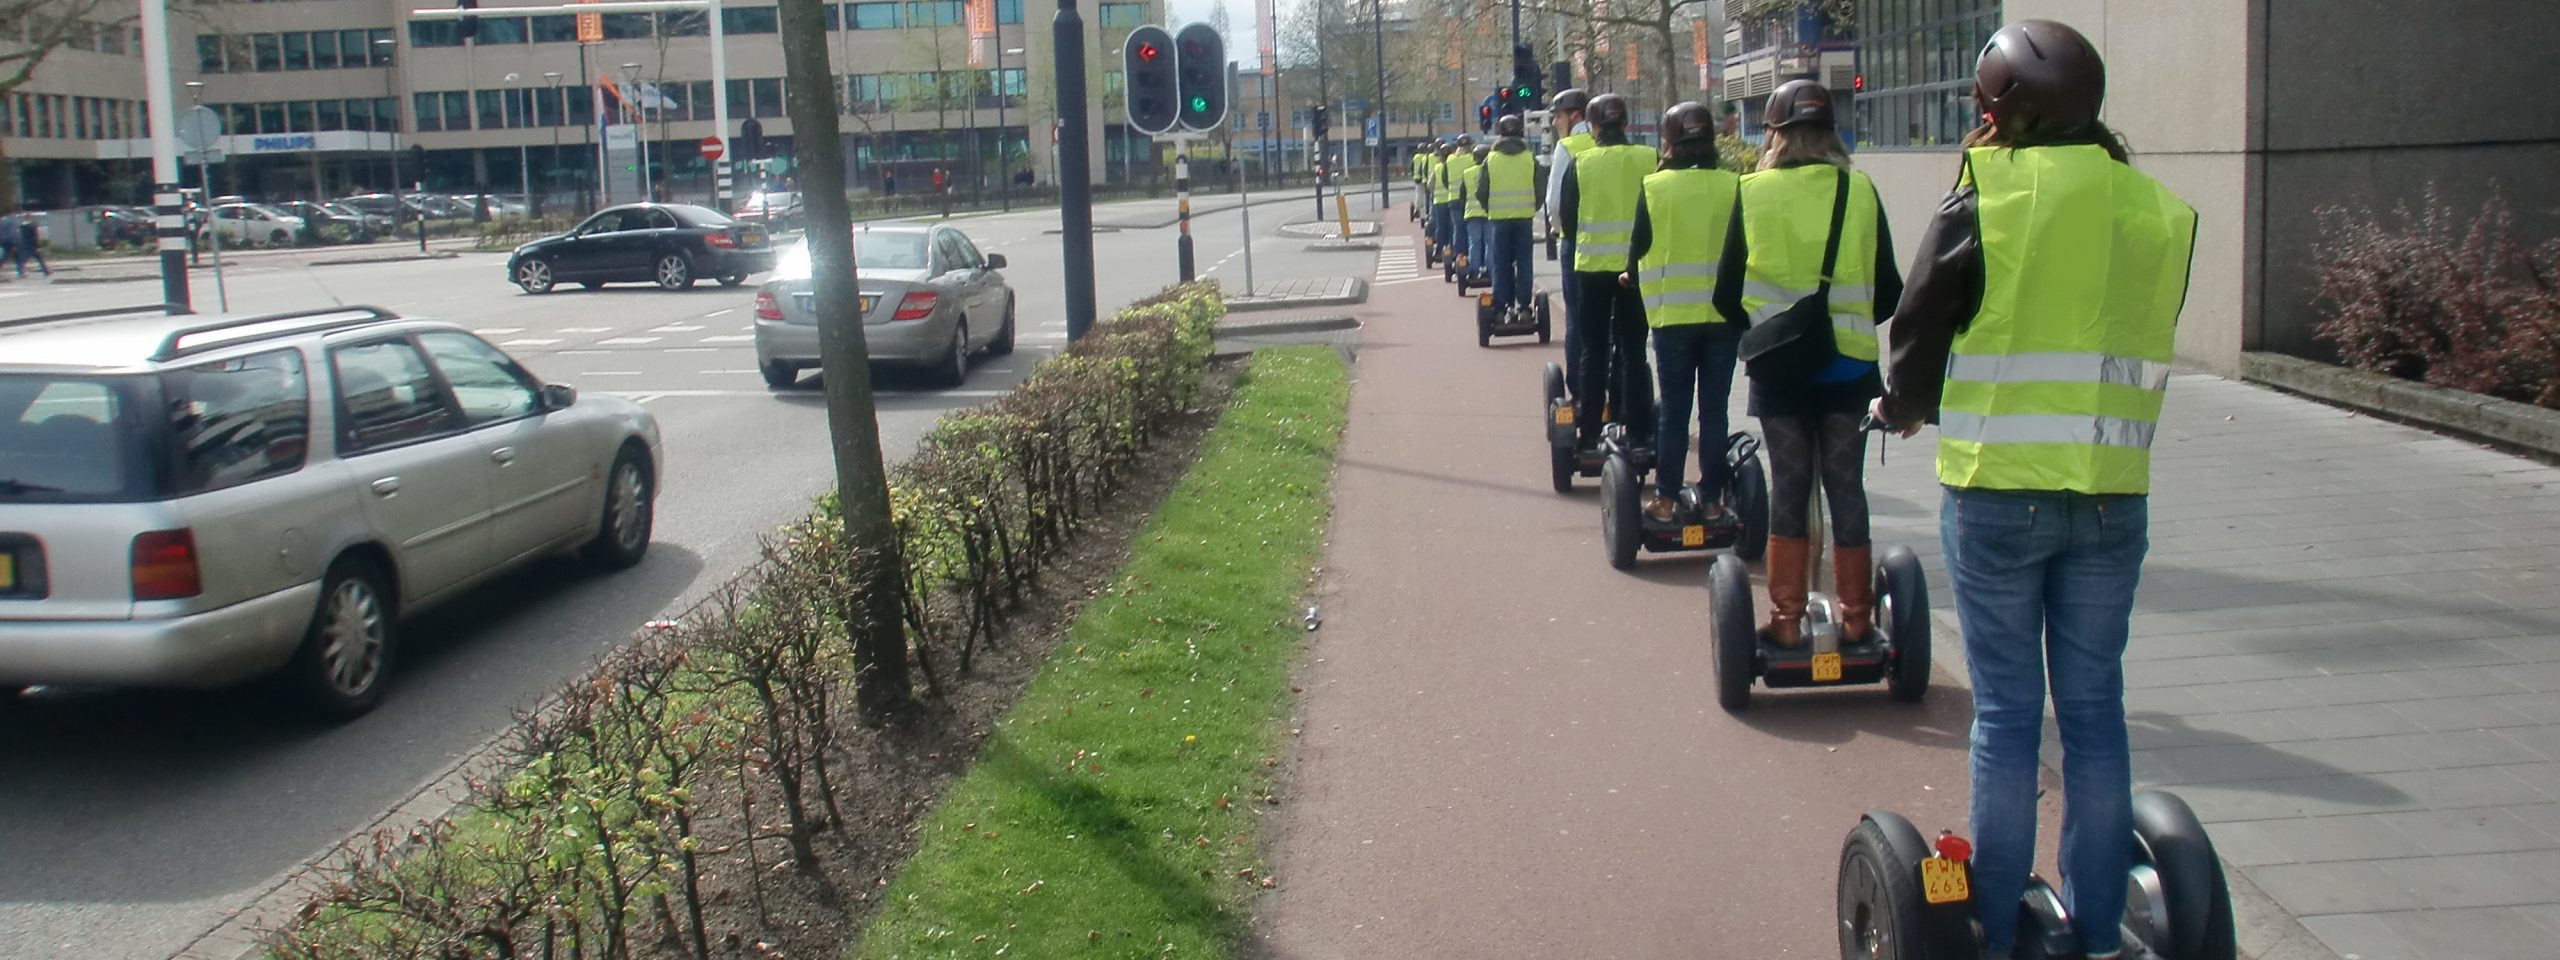 Segway beleving Eindhoven centrum